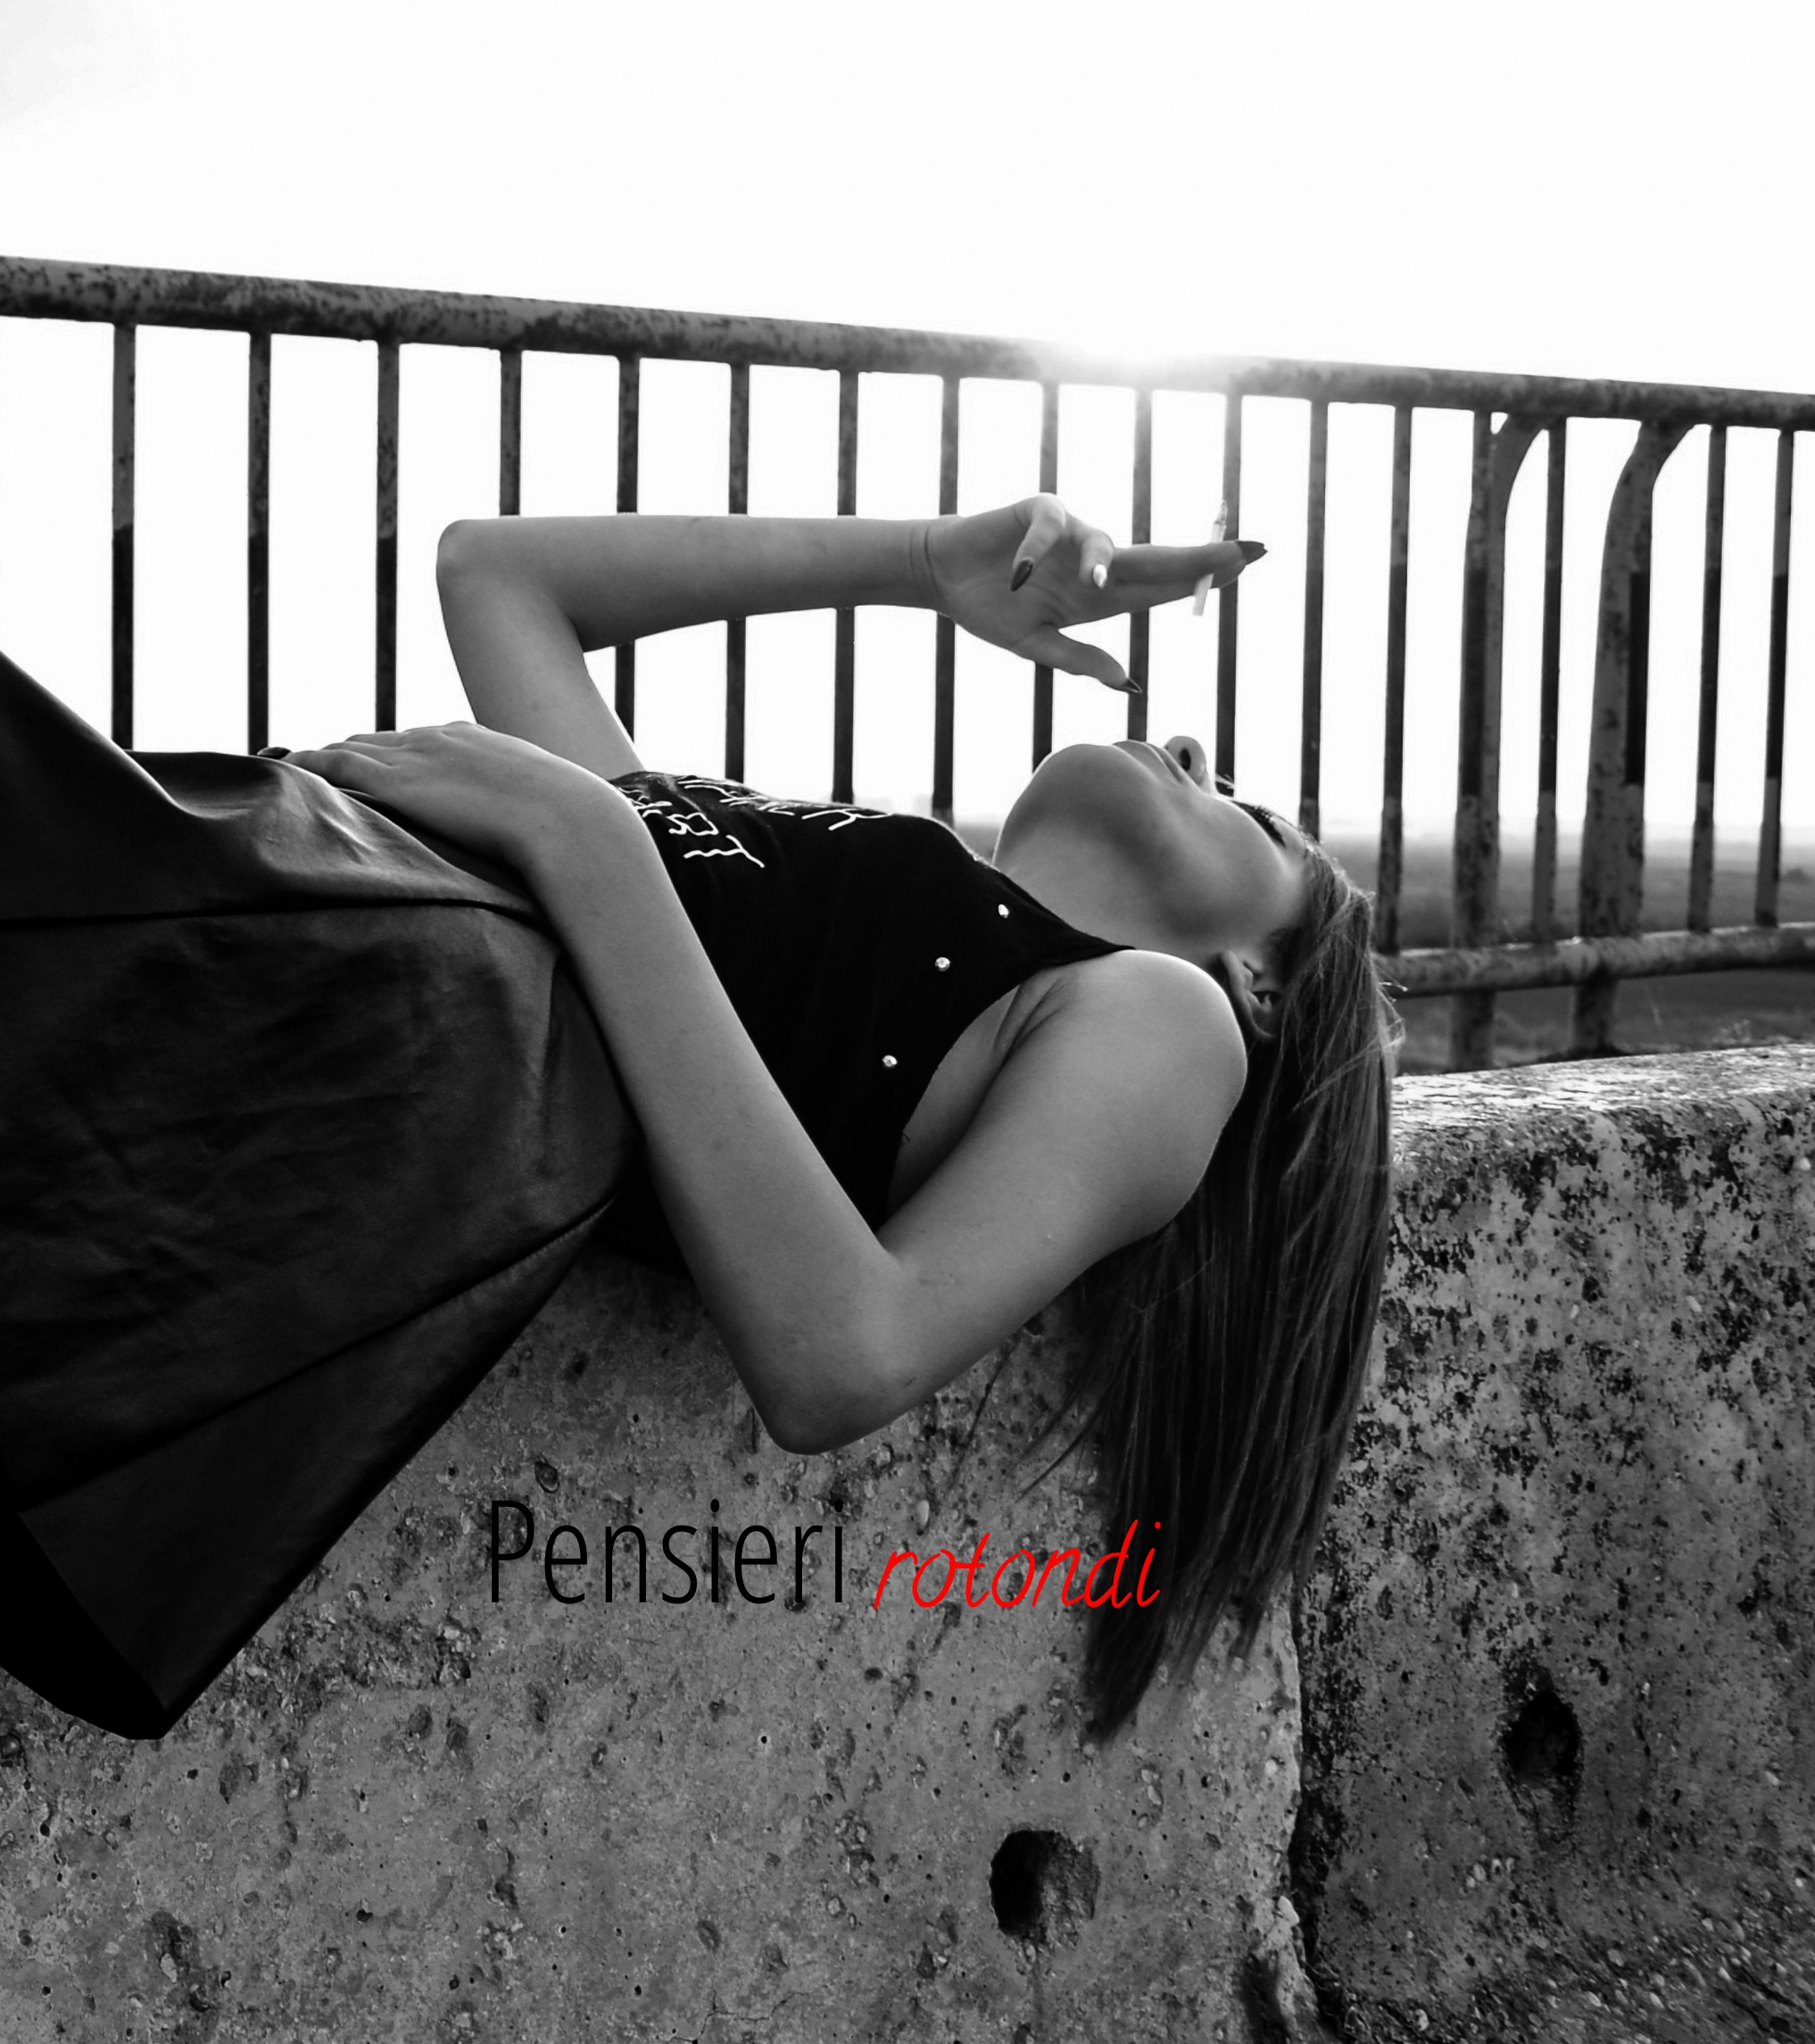 girl-1600363_pe_1_wprn